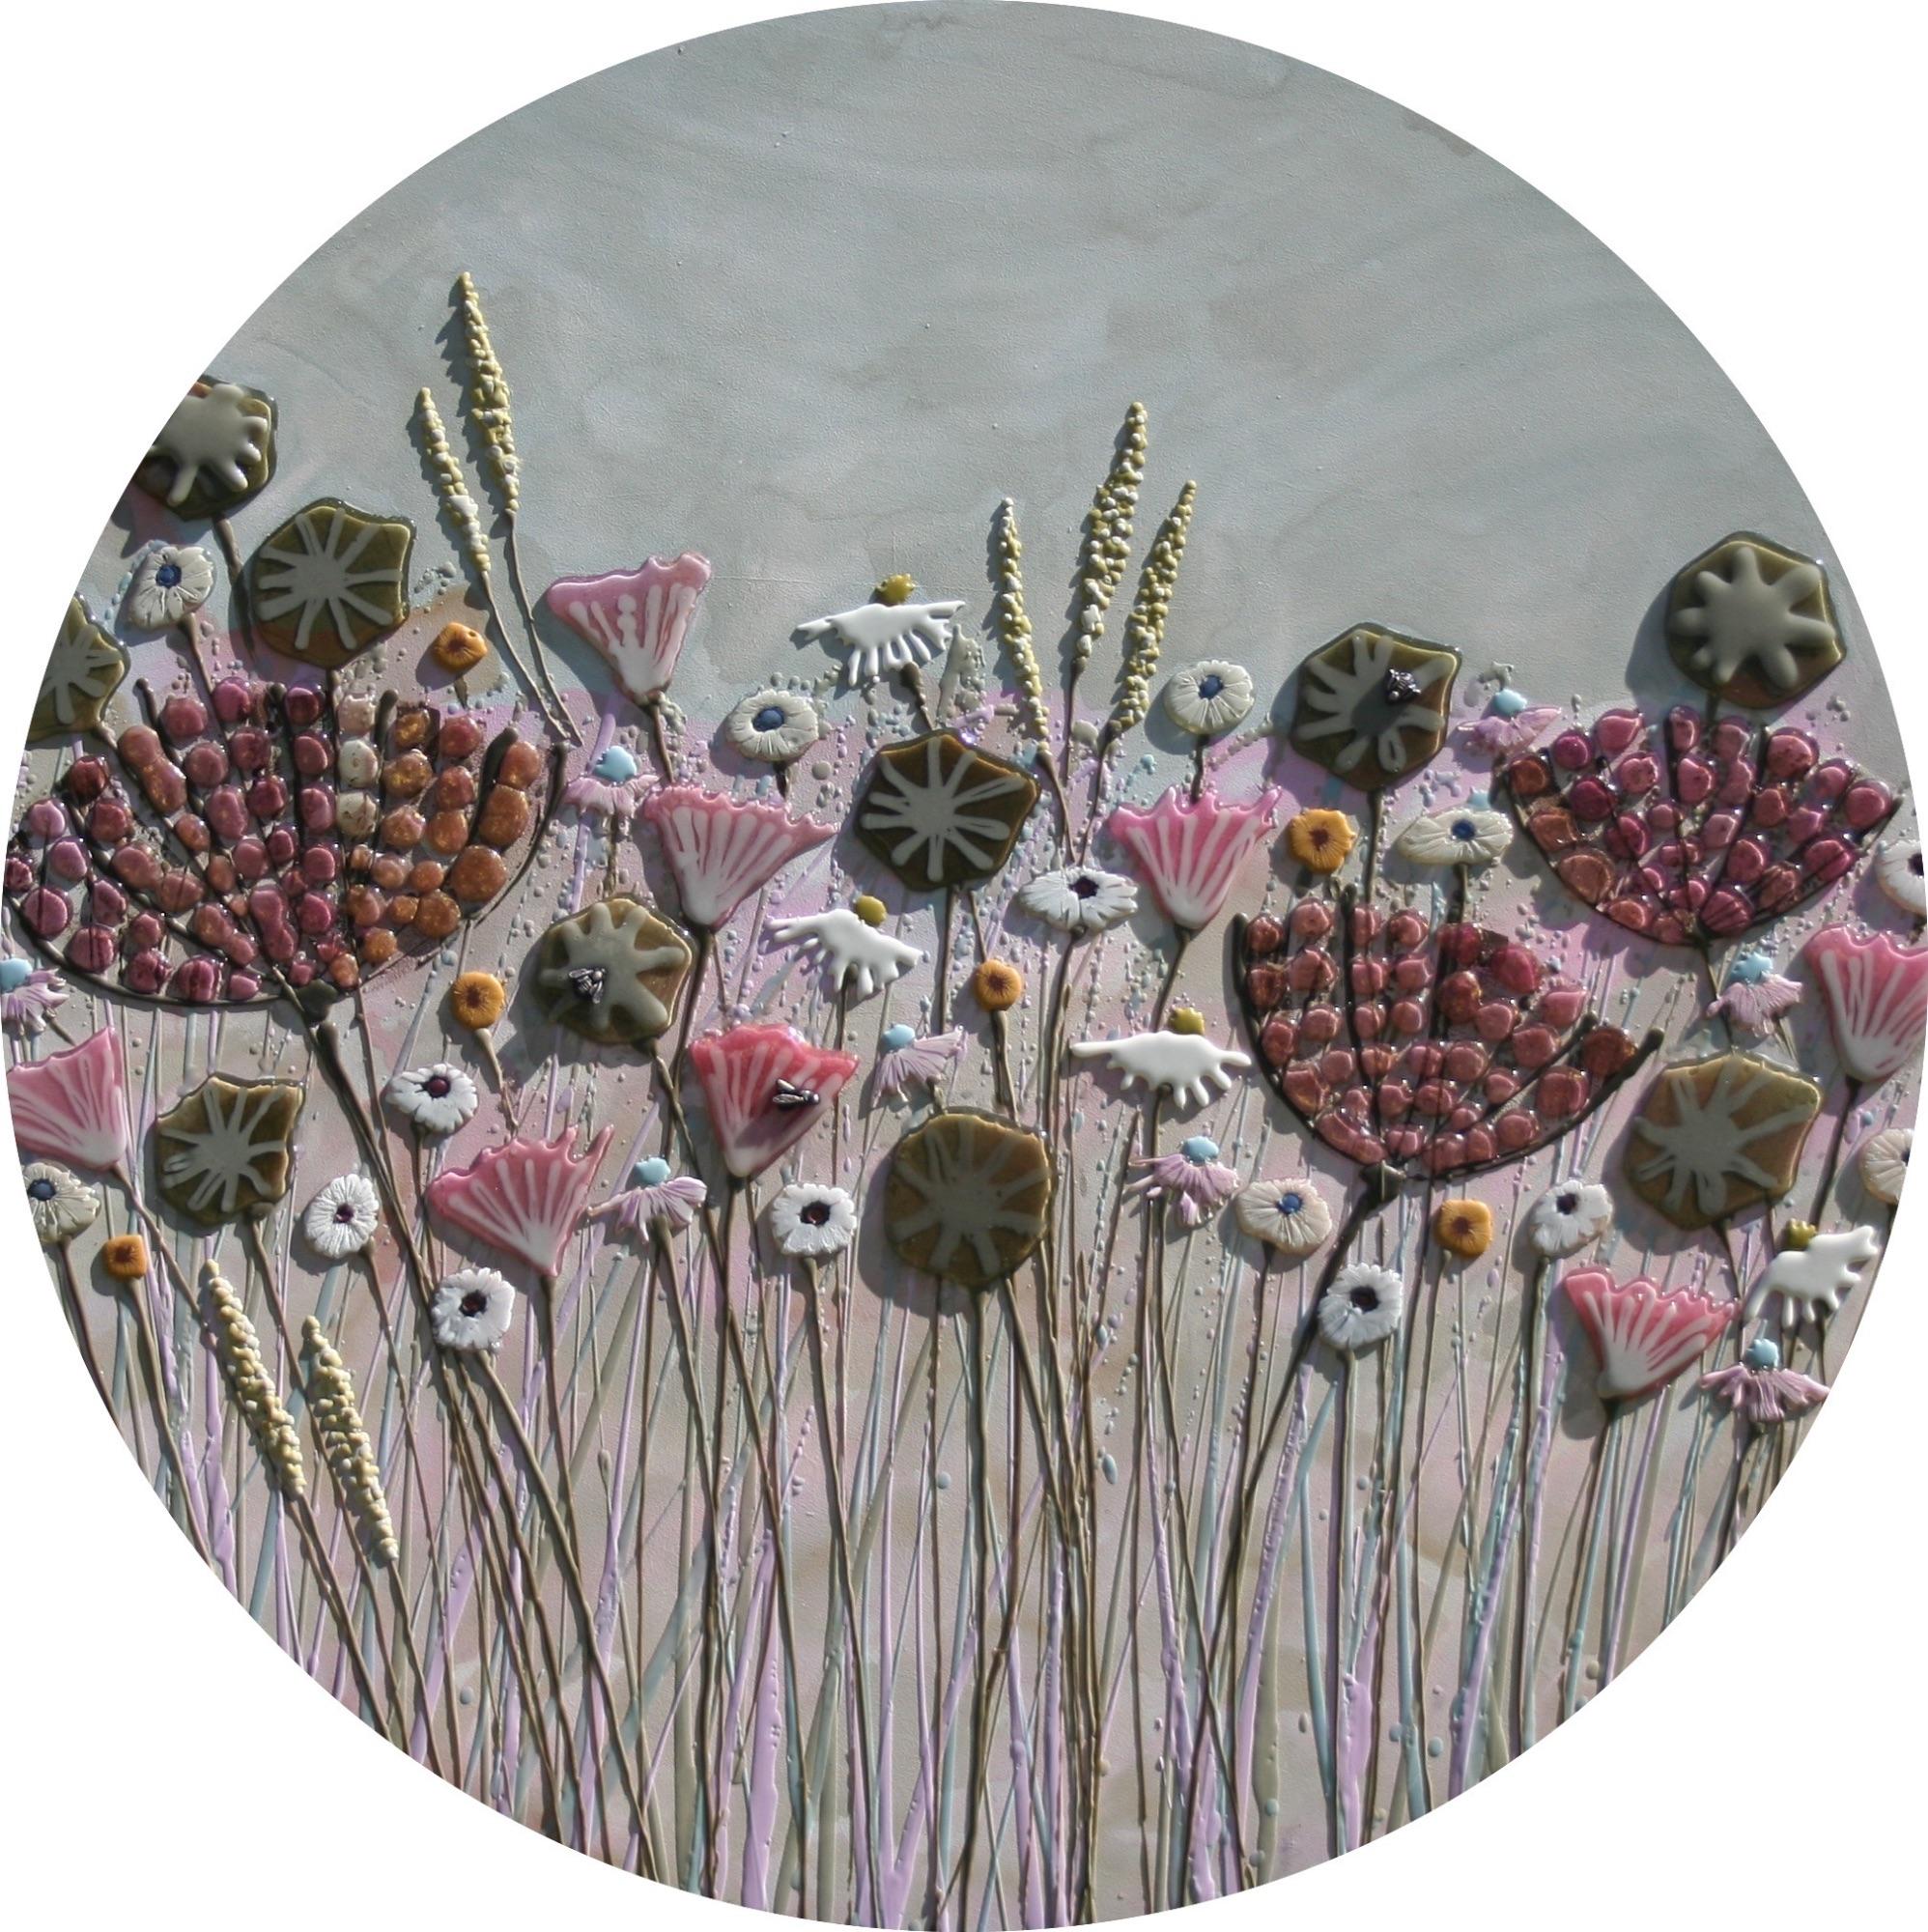 Circular Pink & Green Meadow with Washy Sky - 100cm Diameter - Beeswax & Glass on Board